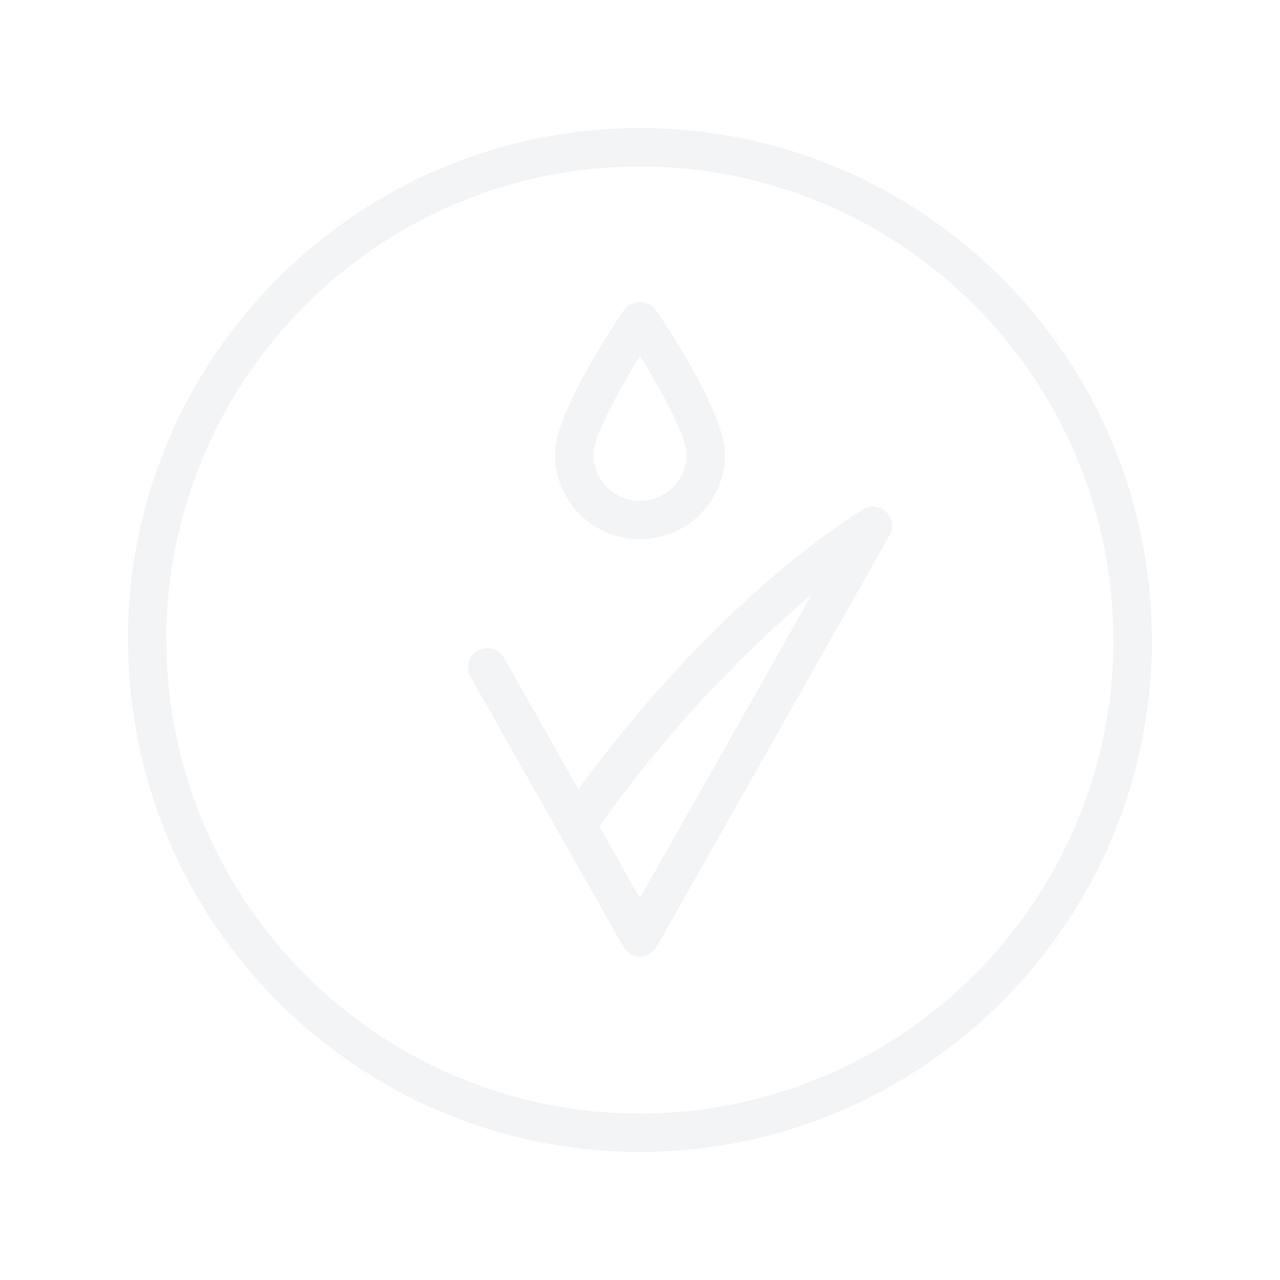 L'OREAL Color Riche X Balmain Collection Lipstick помада для губ 4.2g